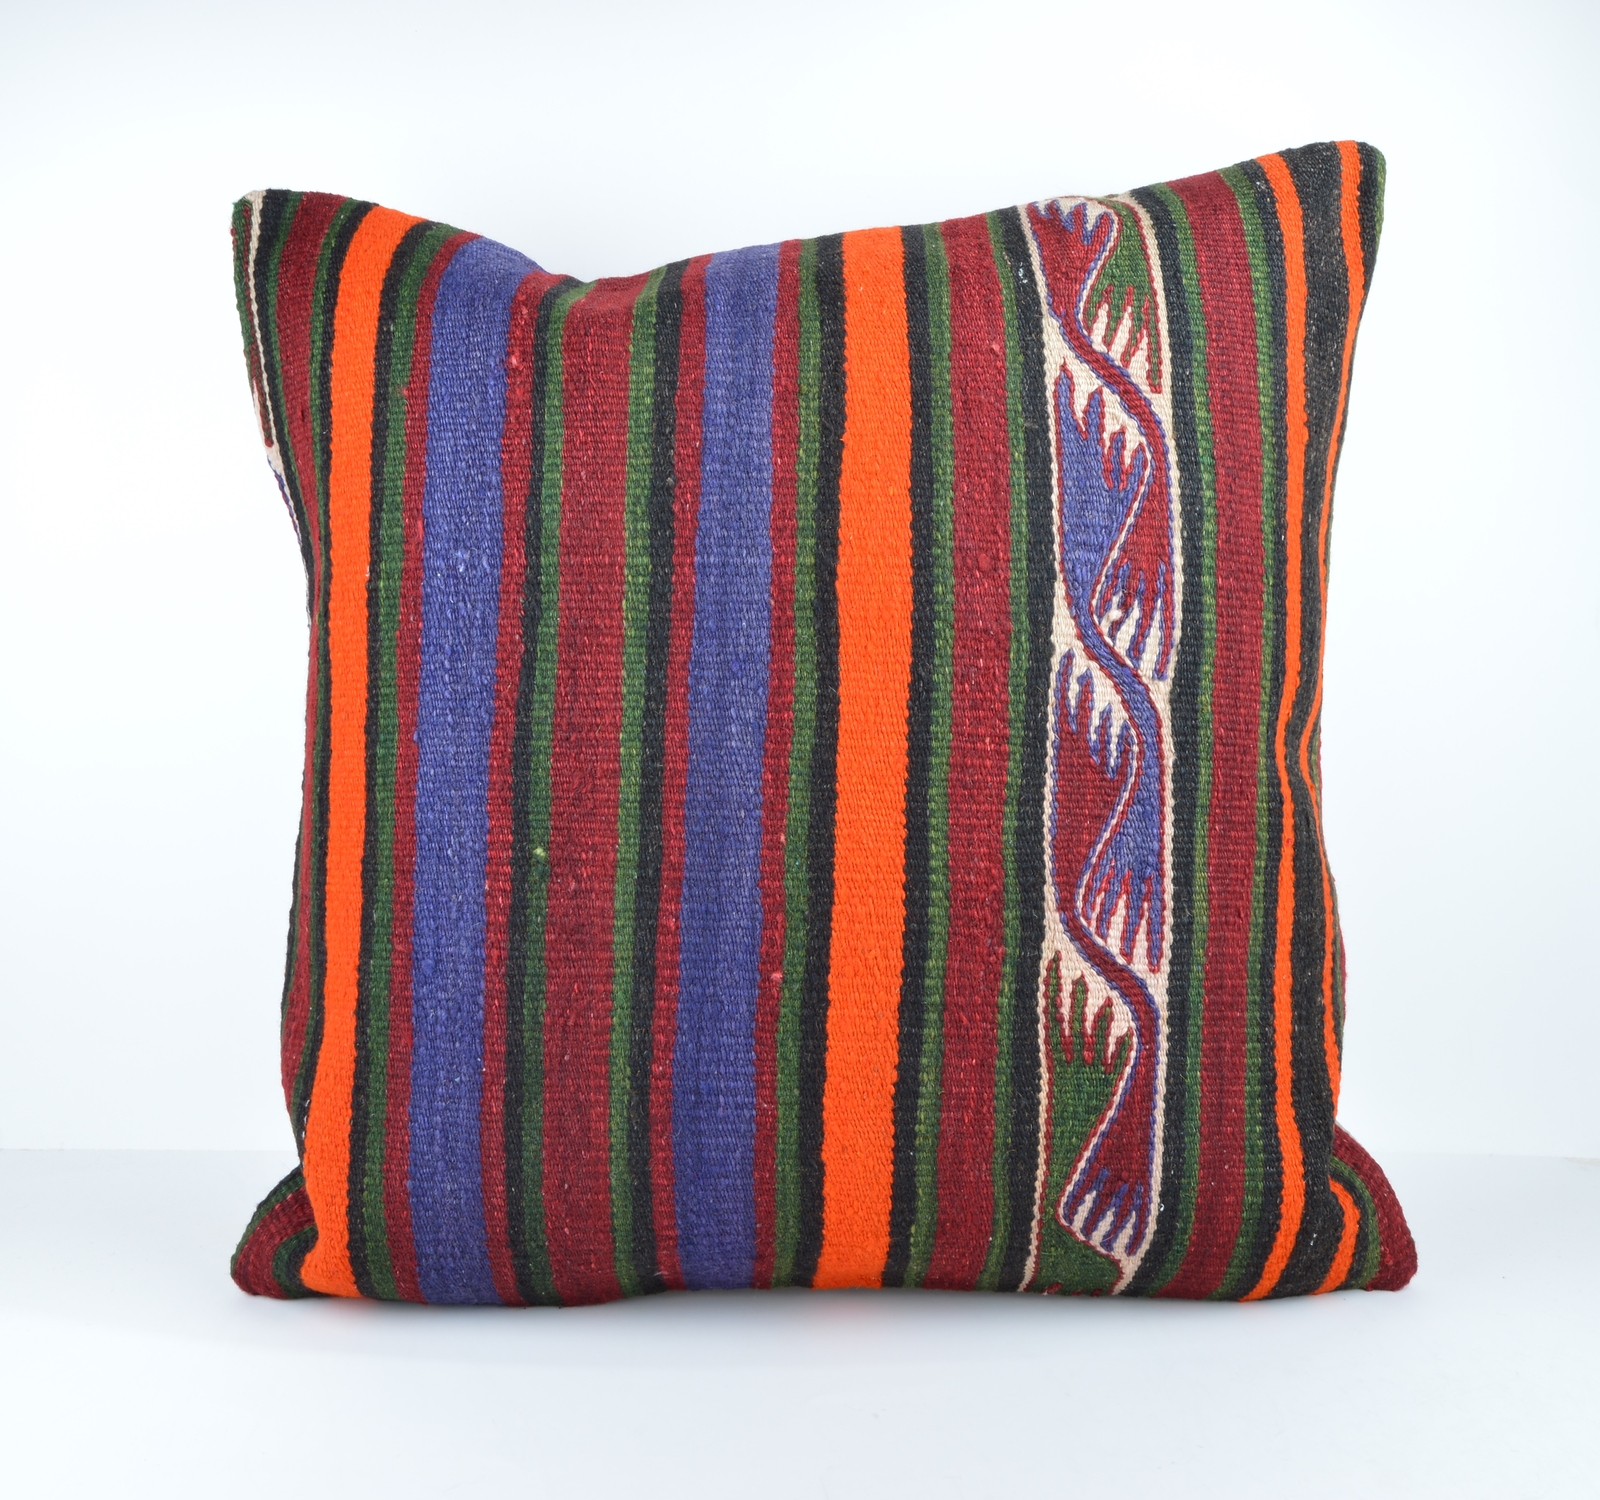 24x24 large kilim pillow big pillow decorative pillow cover large kilim cushion - Pillows